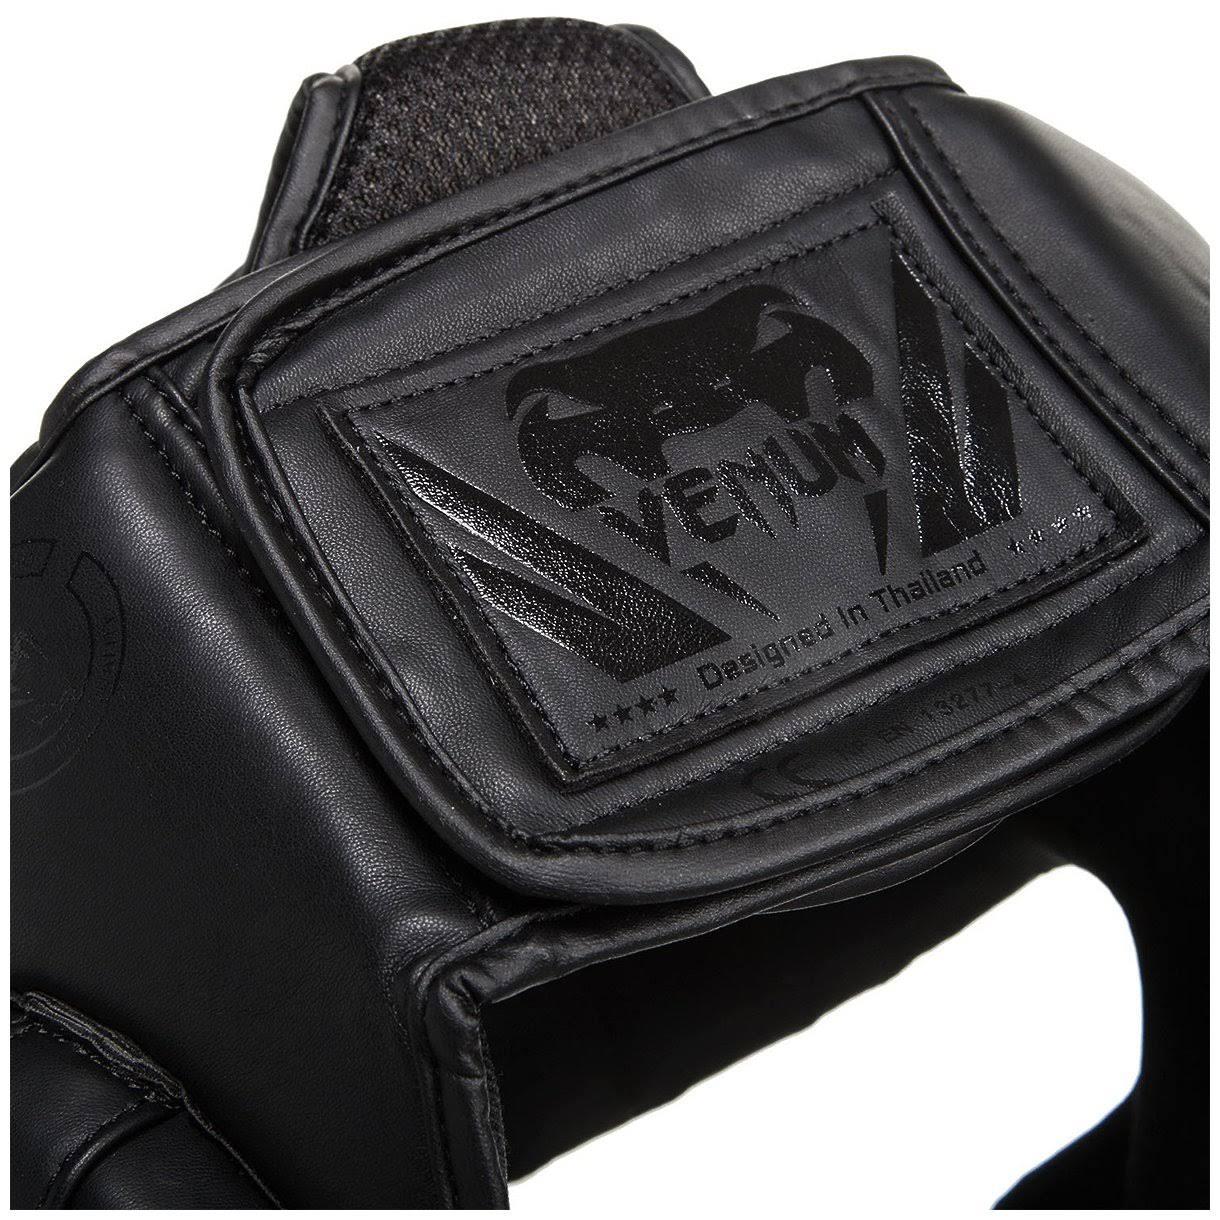 Única Challenger La 0 Accesorios Negro Talla 2 Cabeza Venum Negro Tamaño Para UIWWf1RP